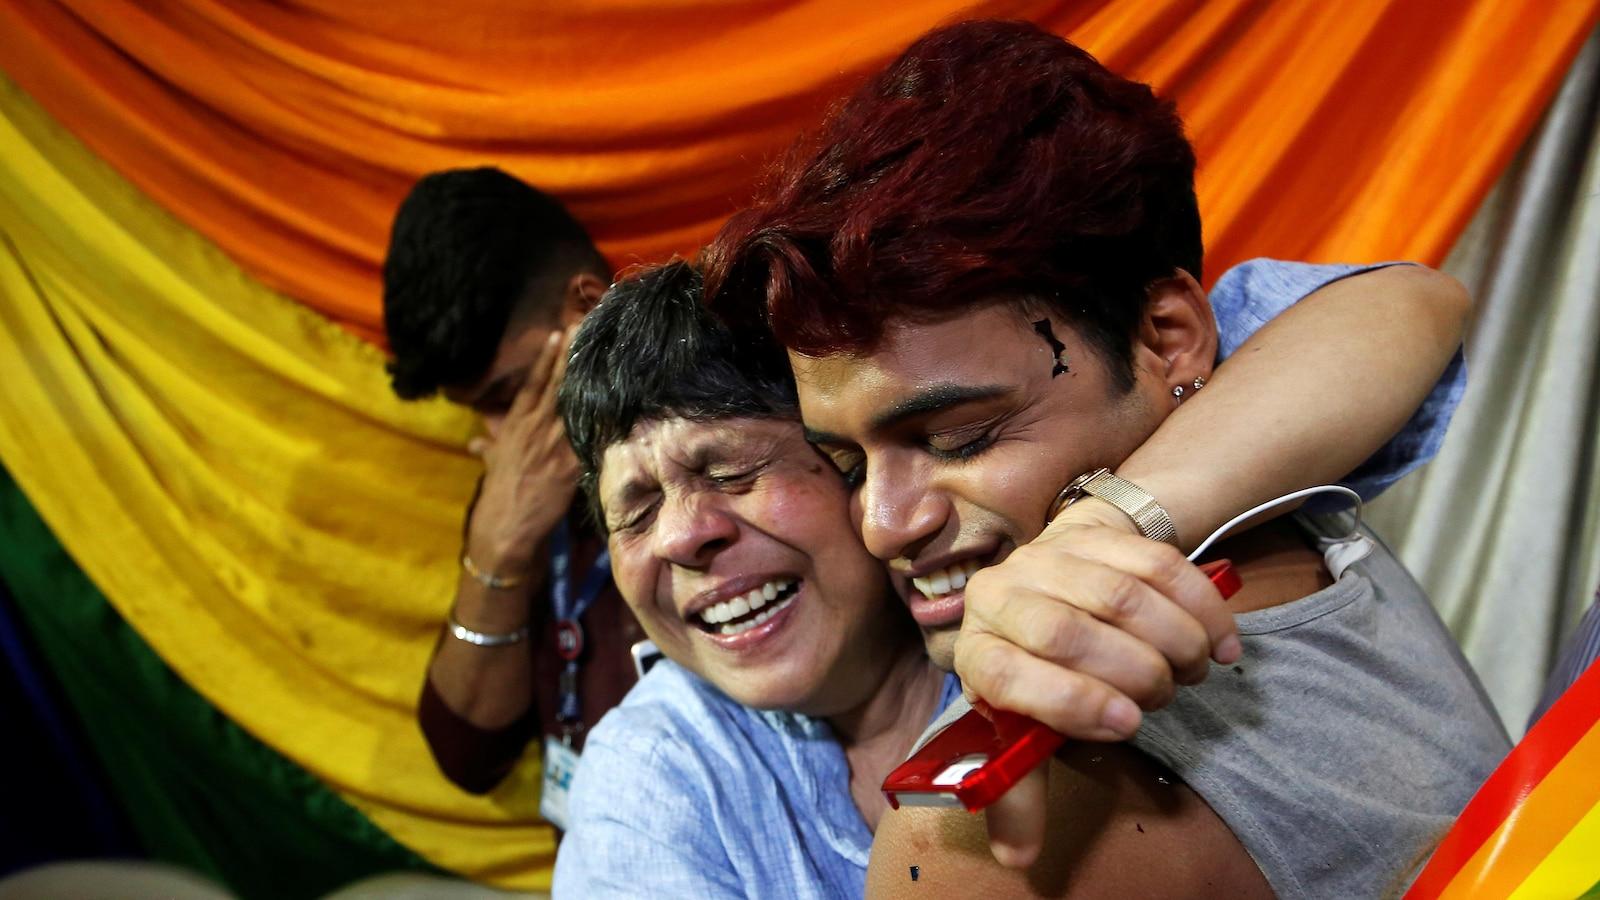 indien gay sexe histoirechatte putain gicler